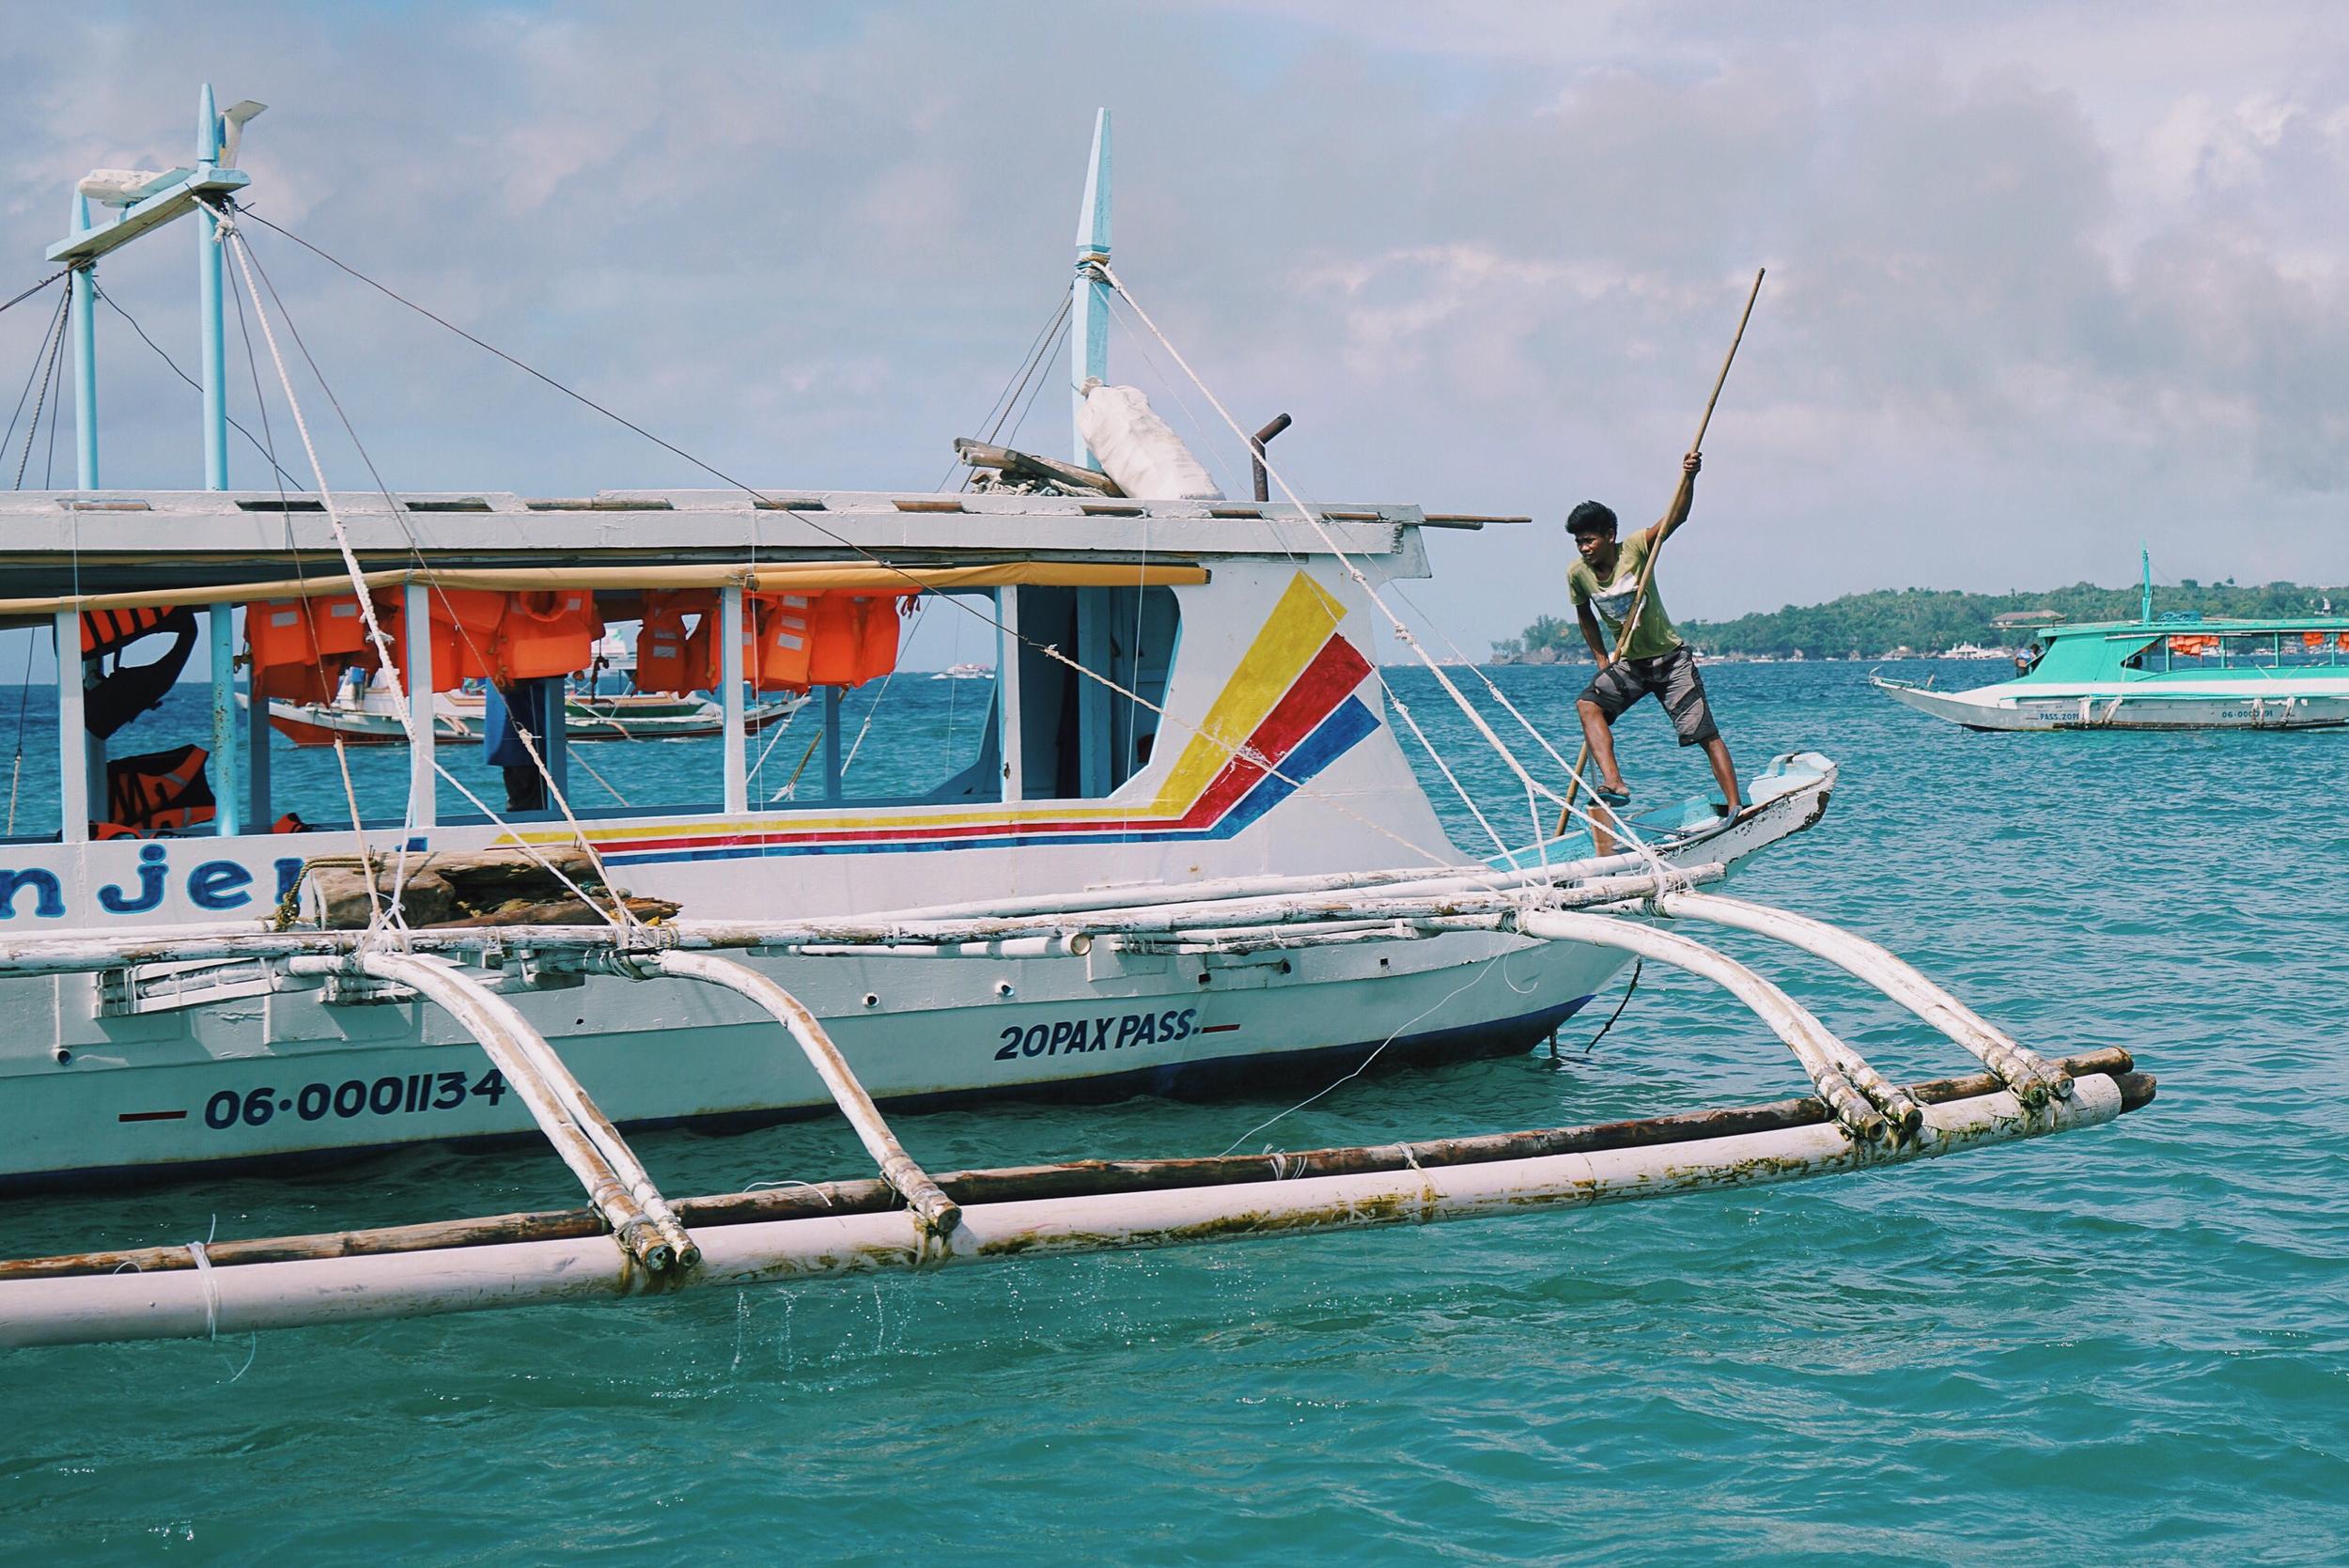 PHL-7_BoatWorker-Edit1.jpg